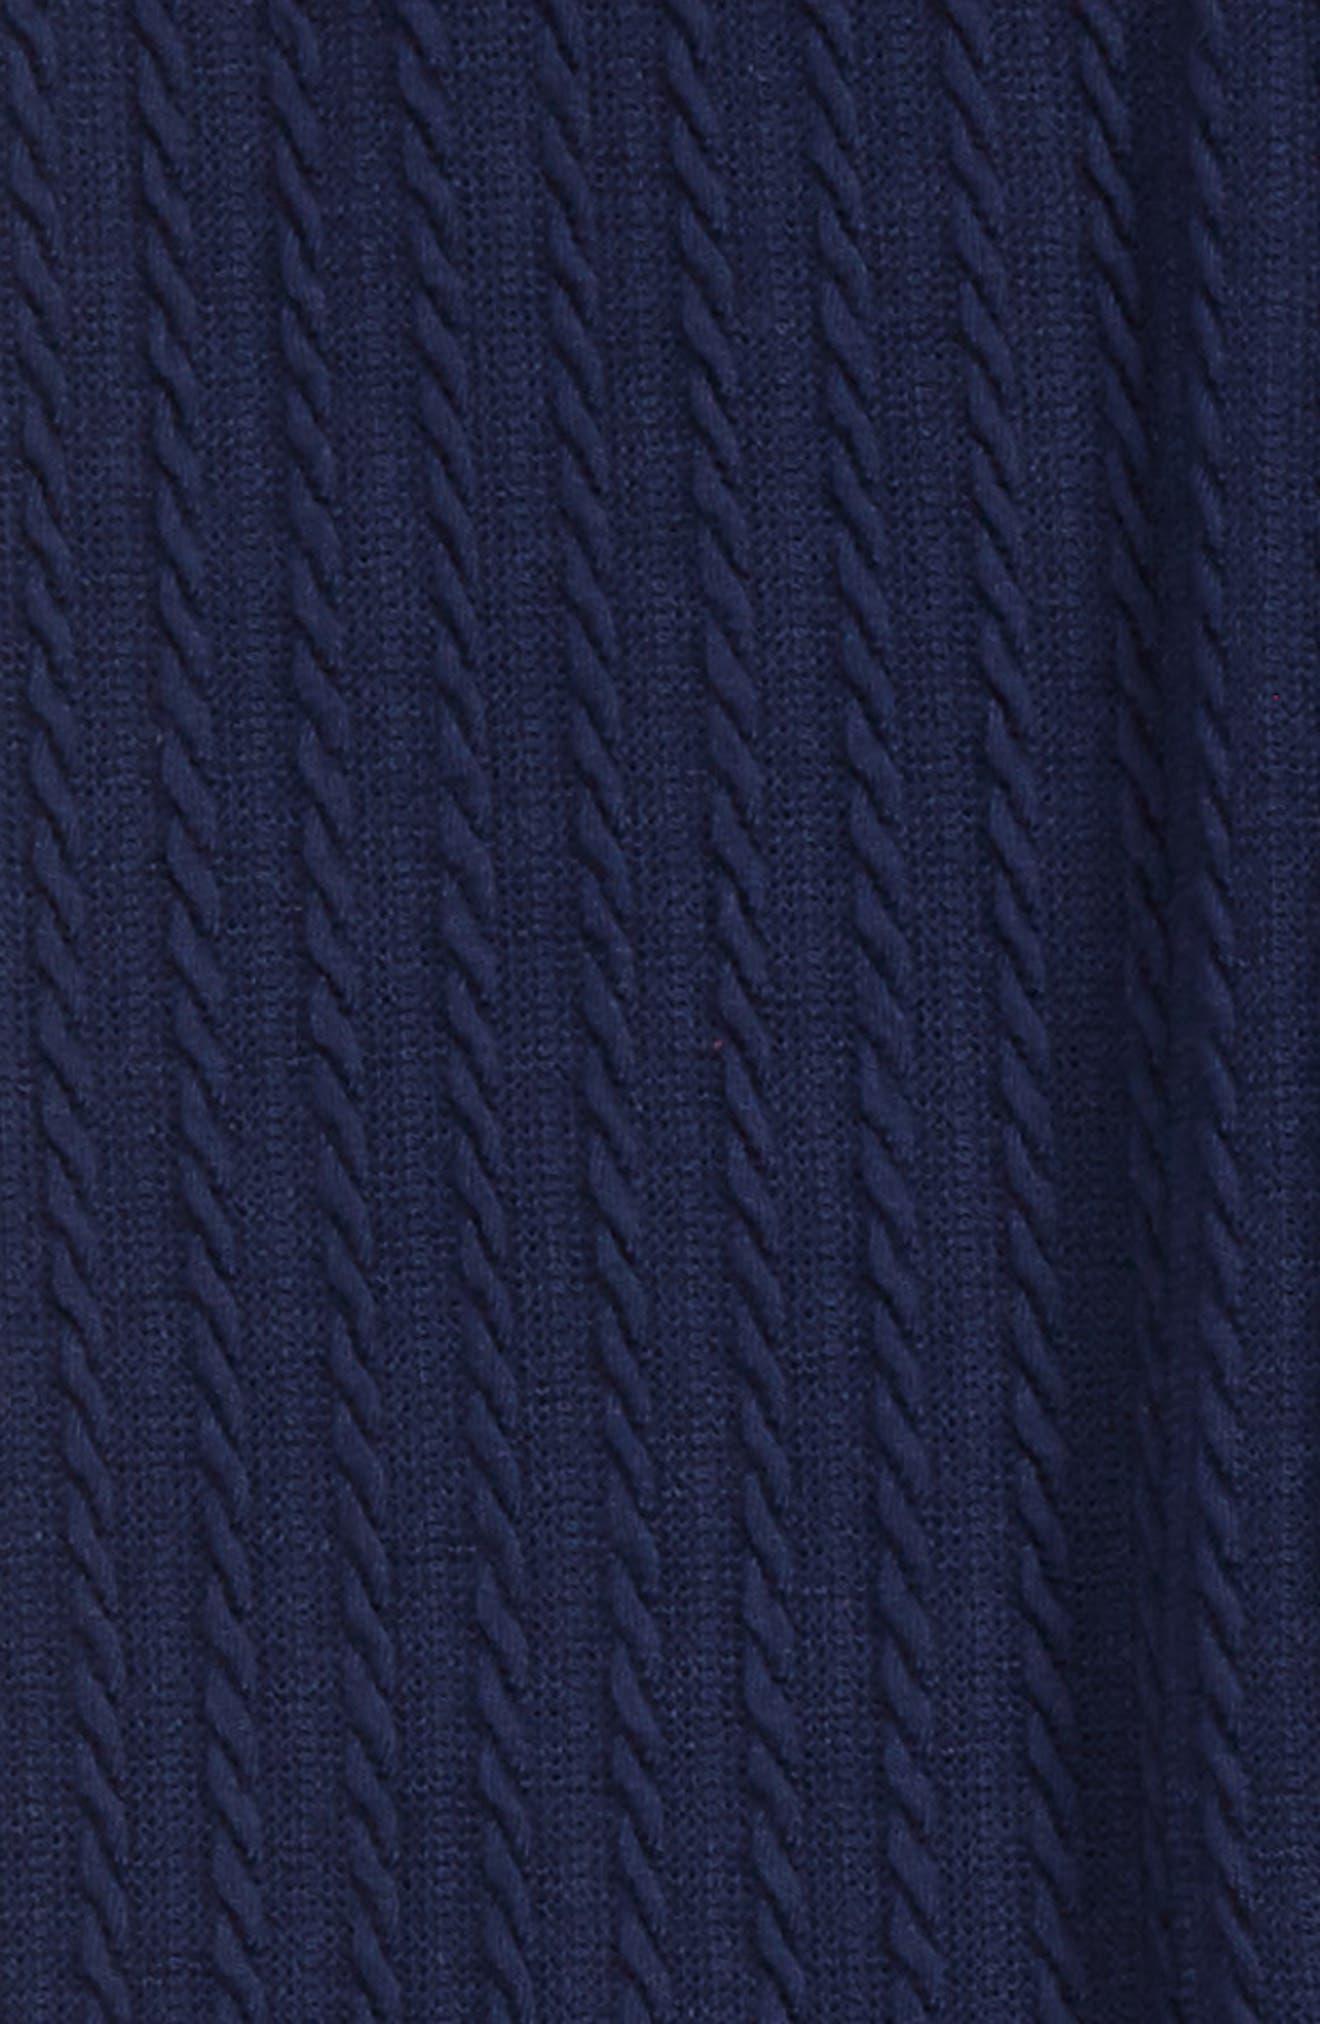 Cable Knit Leggings,                             Alternate thumbnail 10, color,